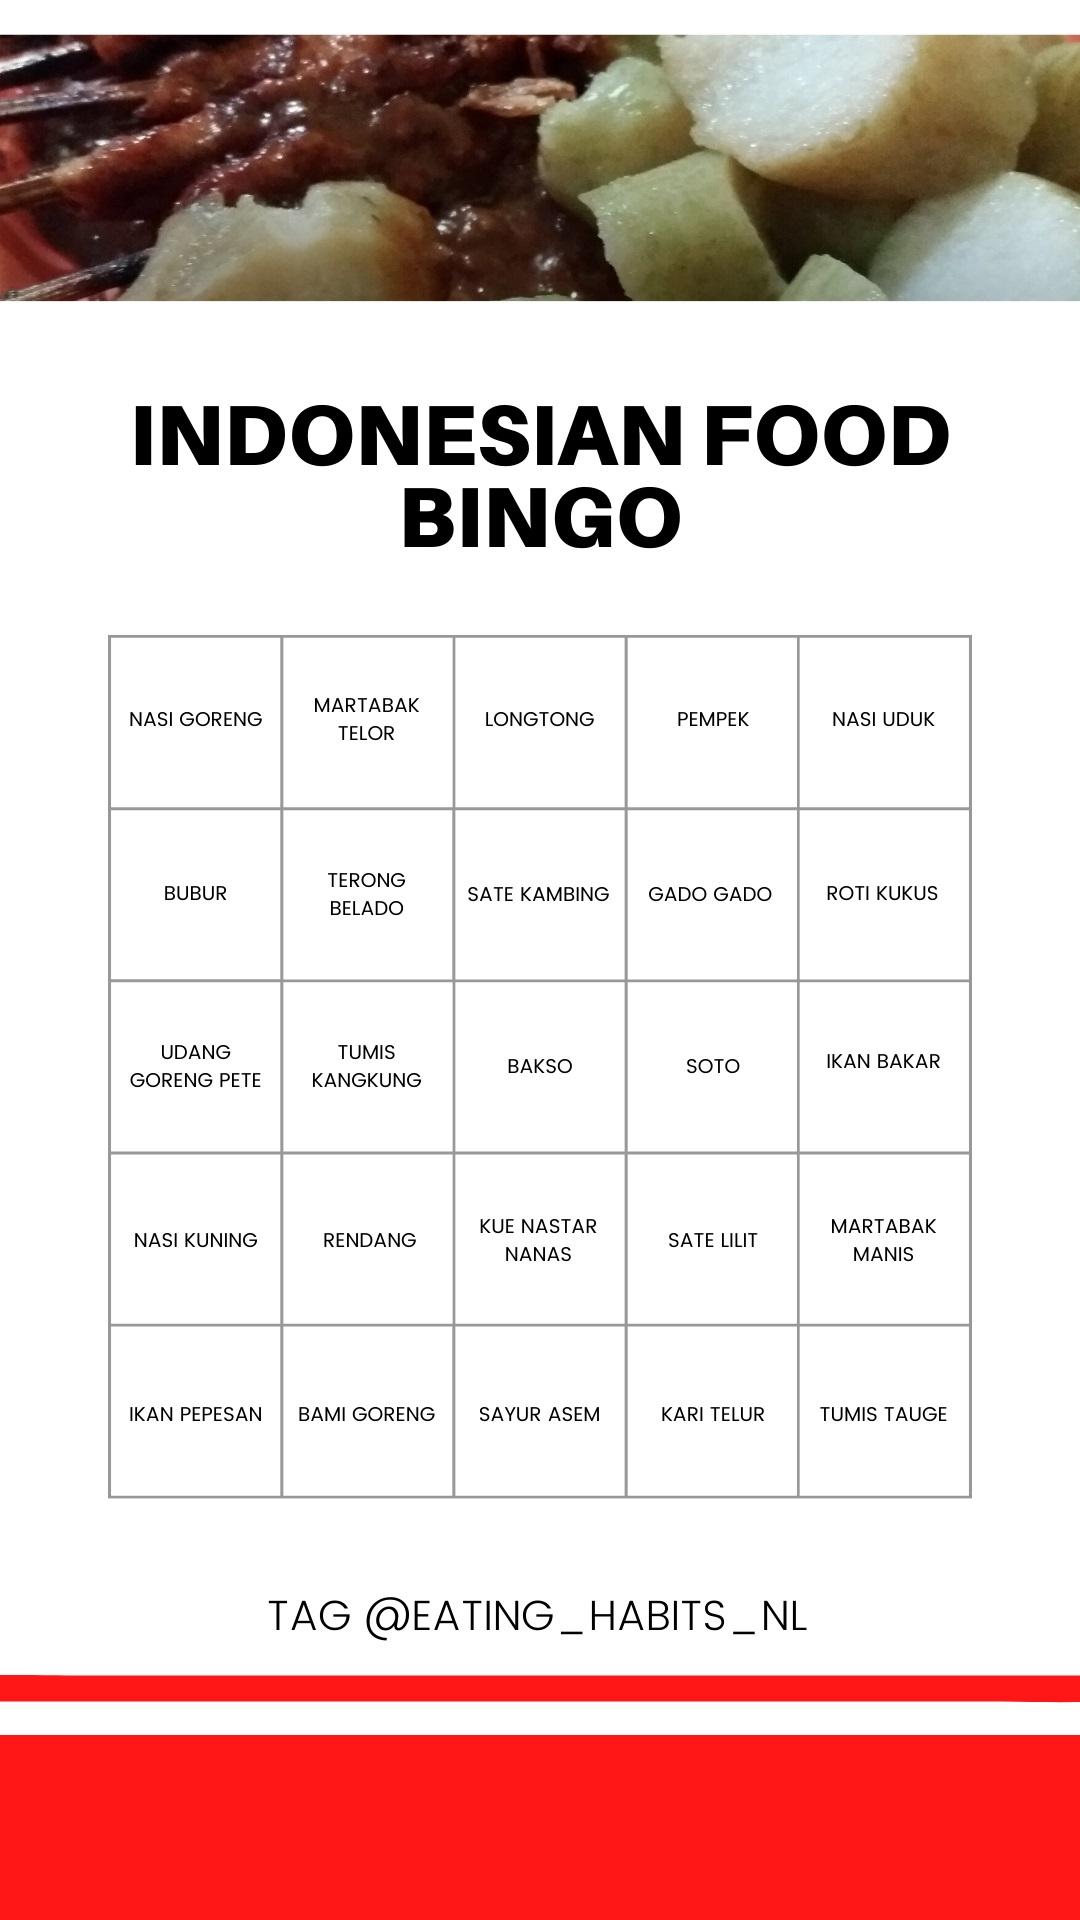 Indonesian food bingo - Eating Habits